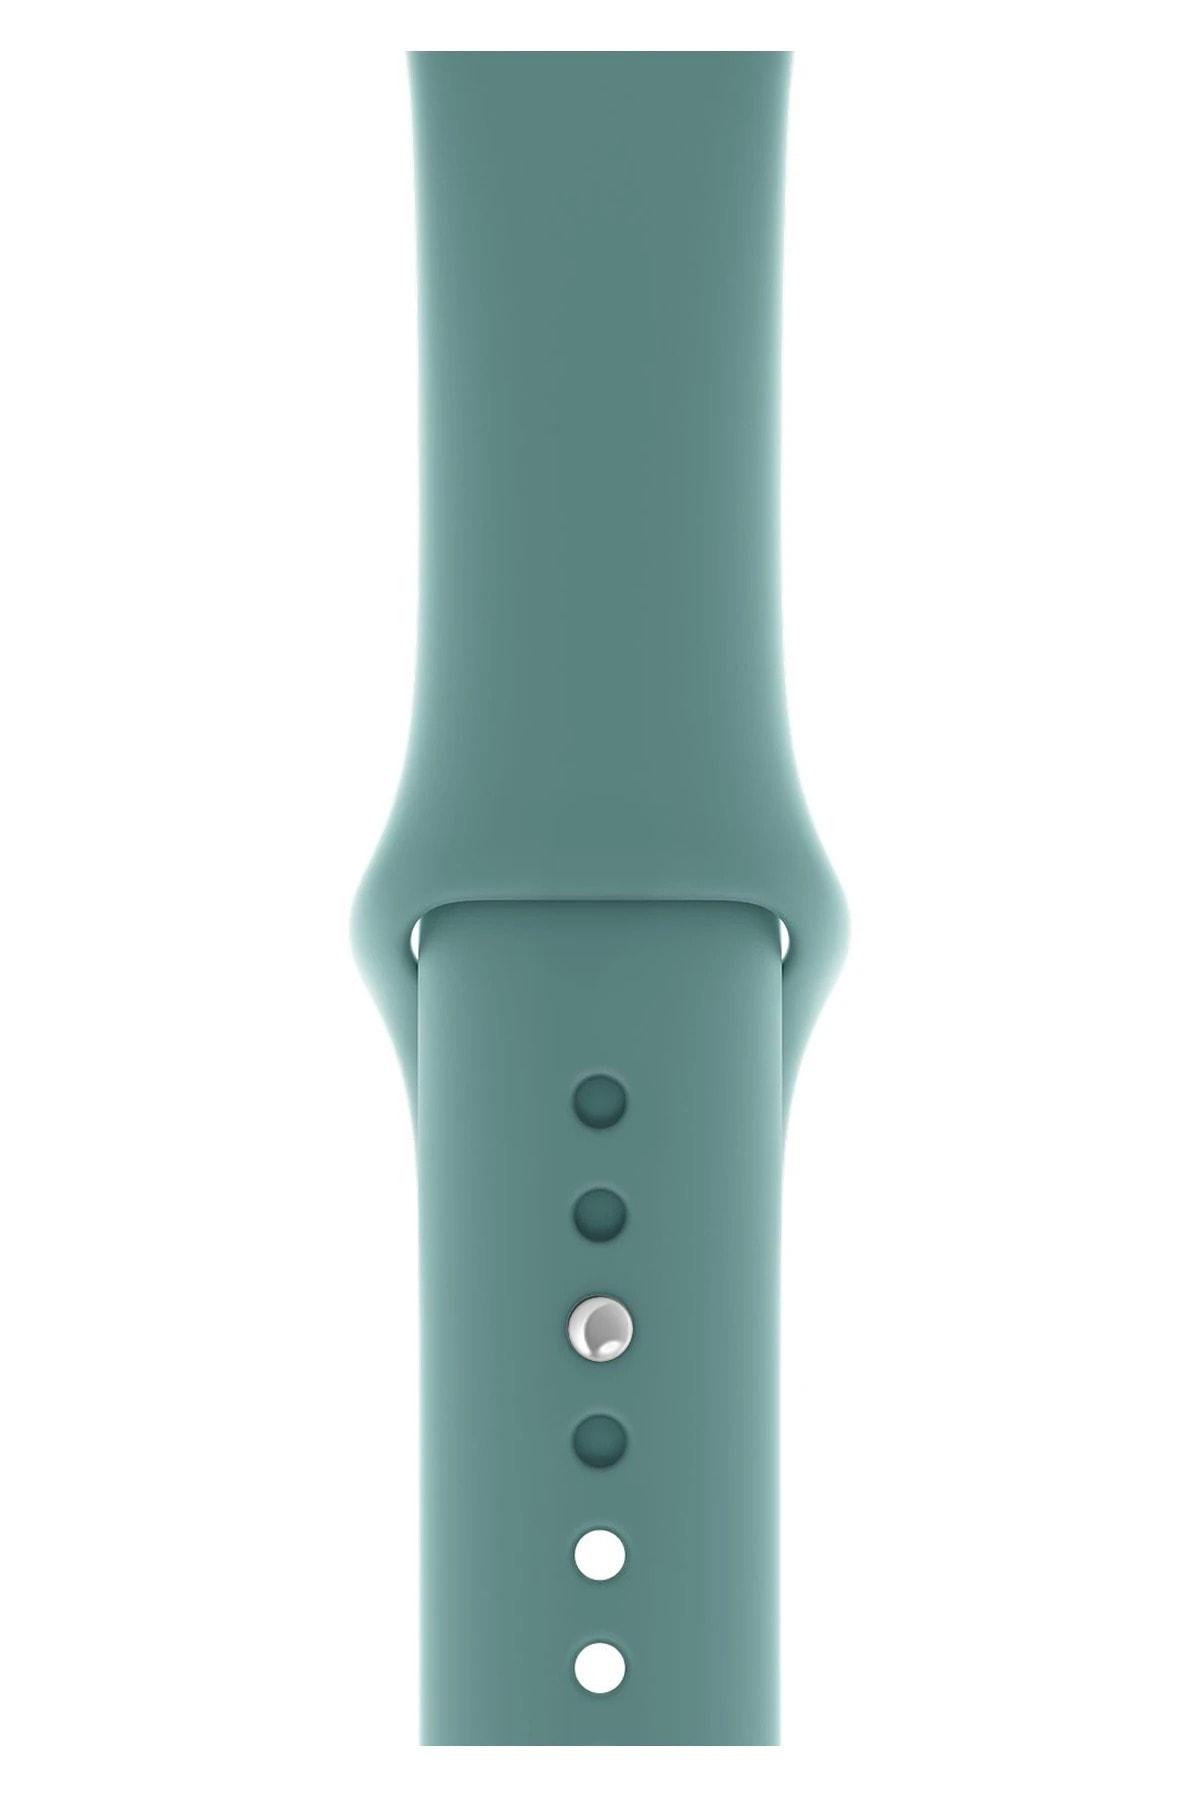 Apple Watch 44mm A+ Yüksek Kalite Spor Klasik Silikon Kordon